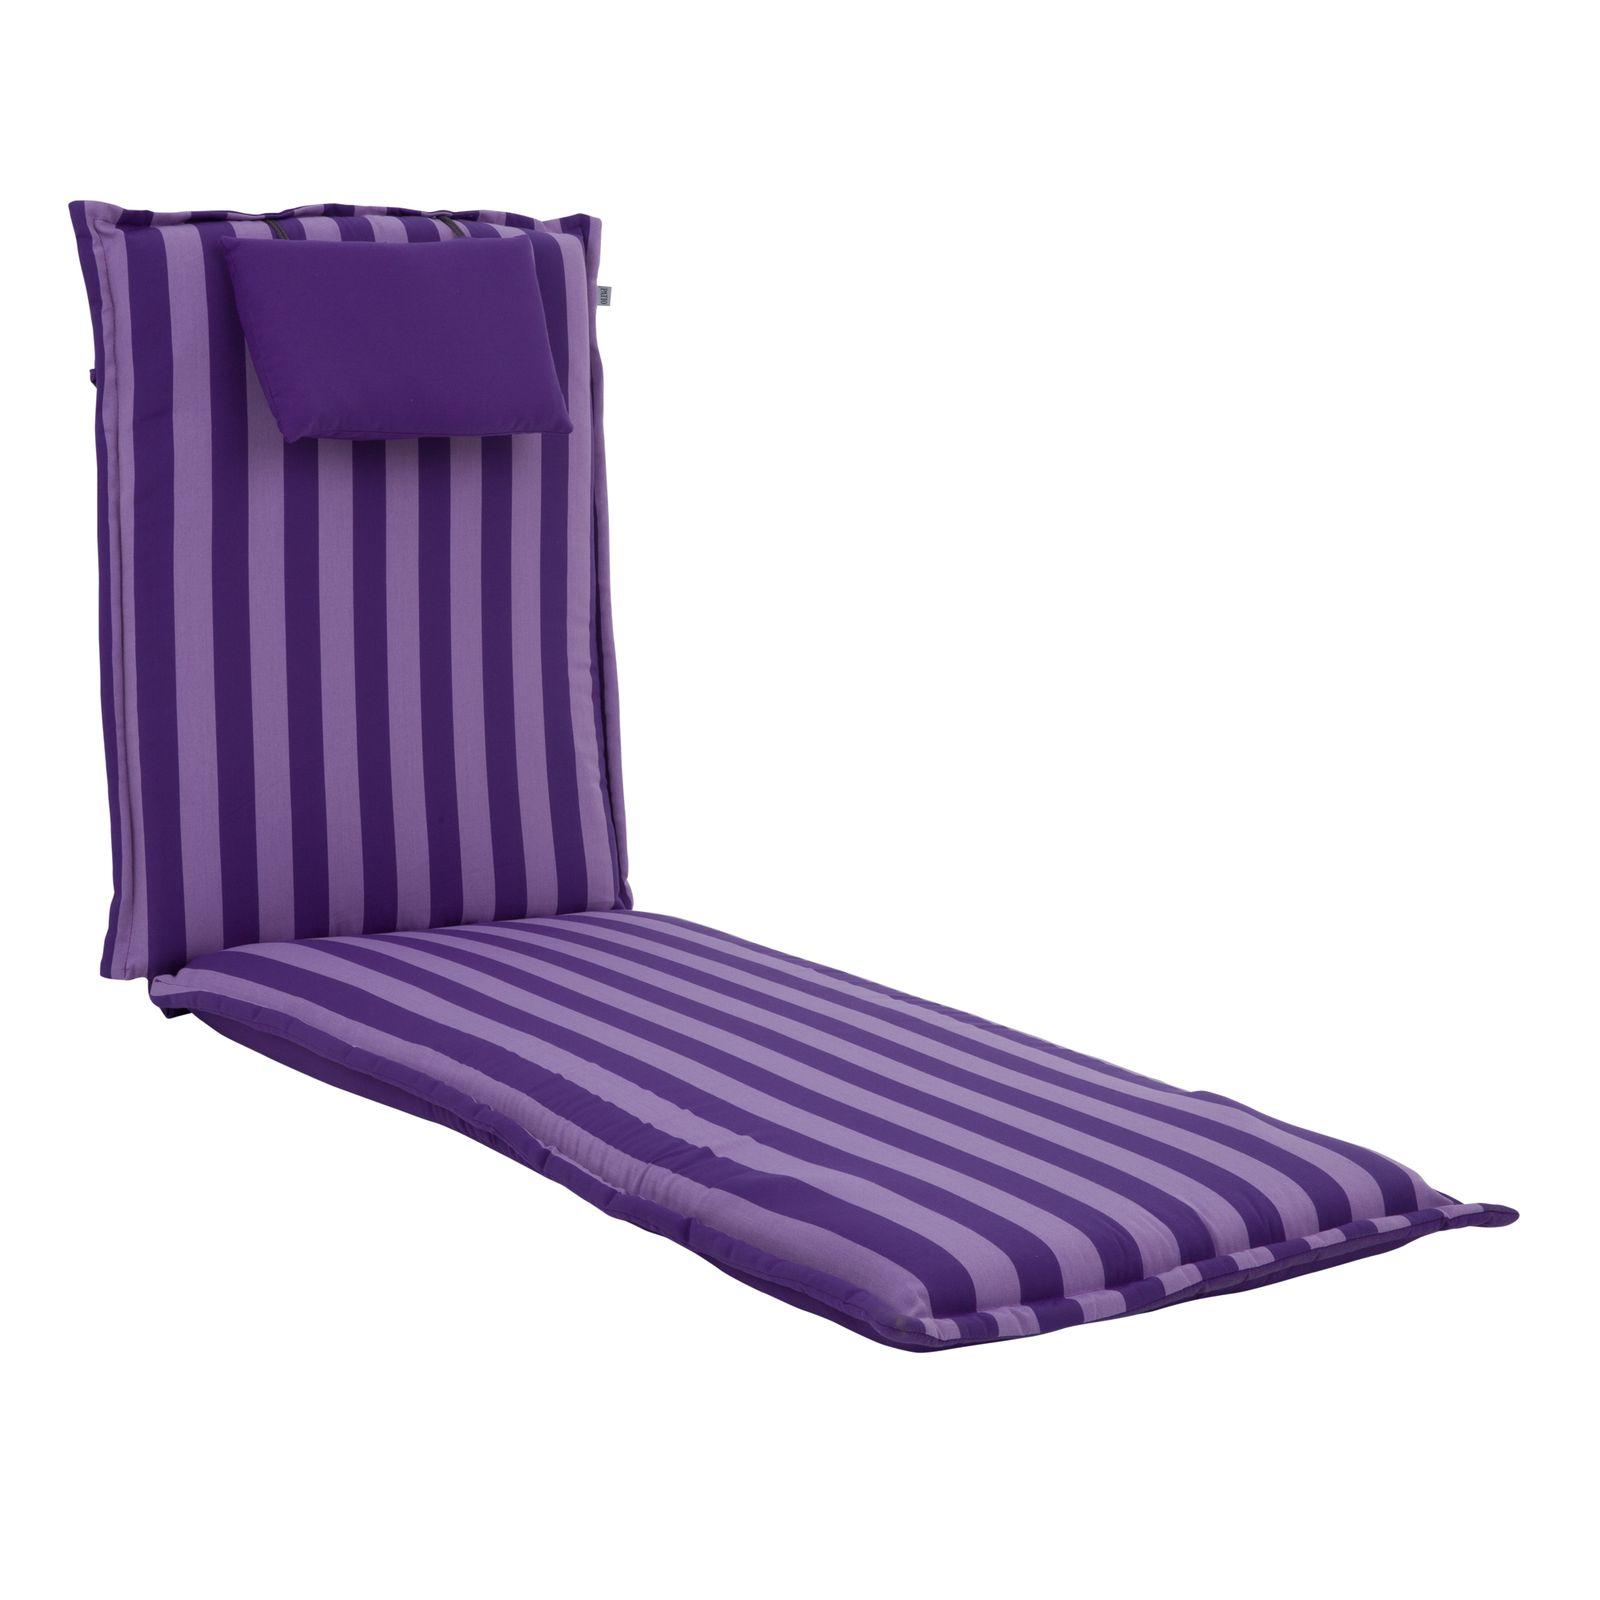 Poduszka na leżak / łóżko Premium Liege L001-08SB PATIO